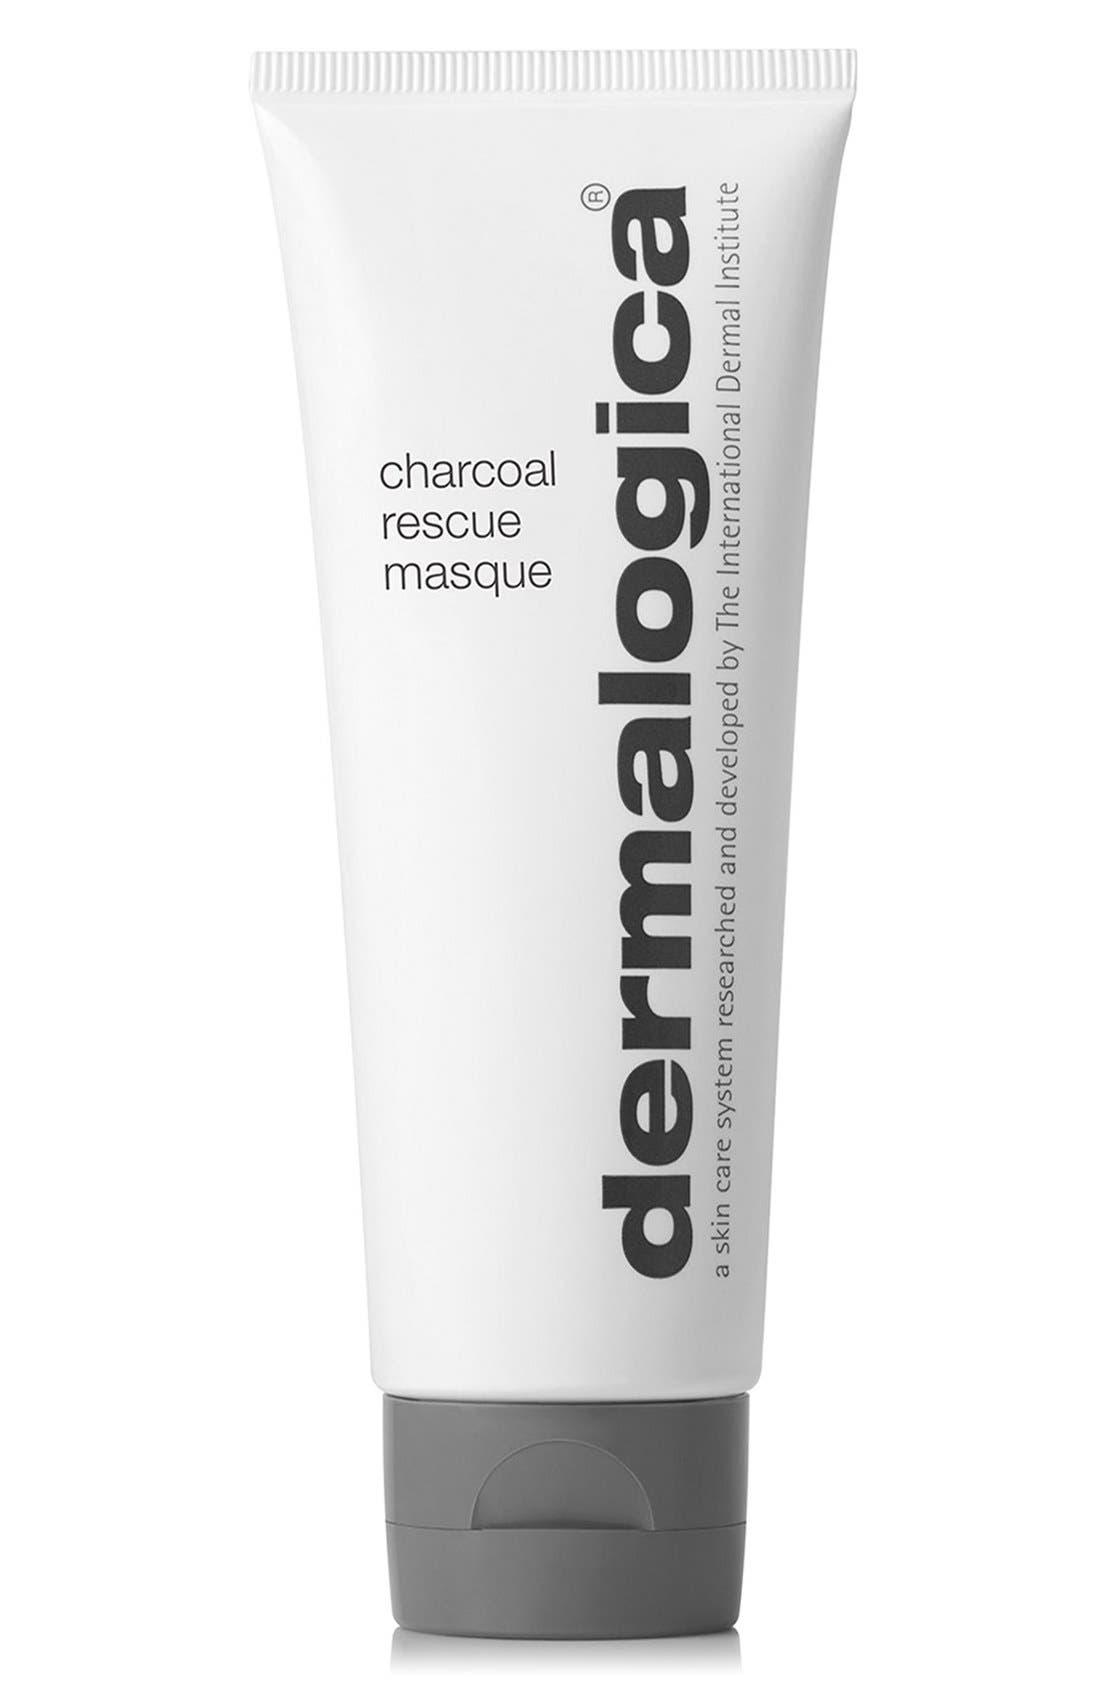 dermalogica® Charcoal Rescue Masque